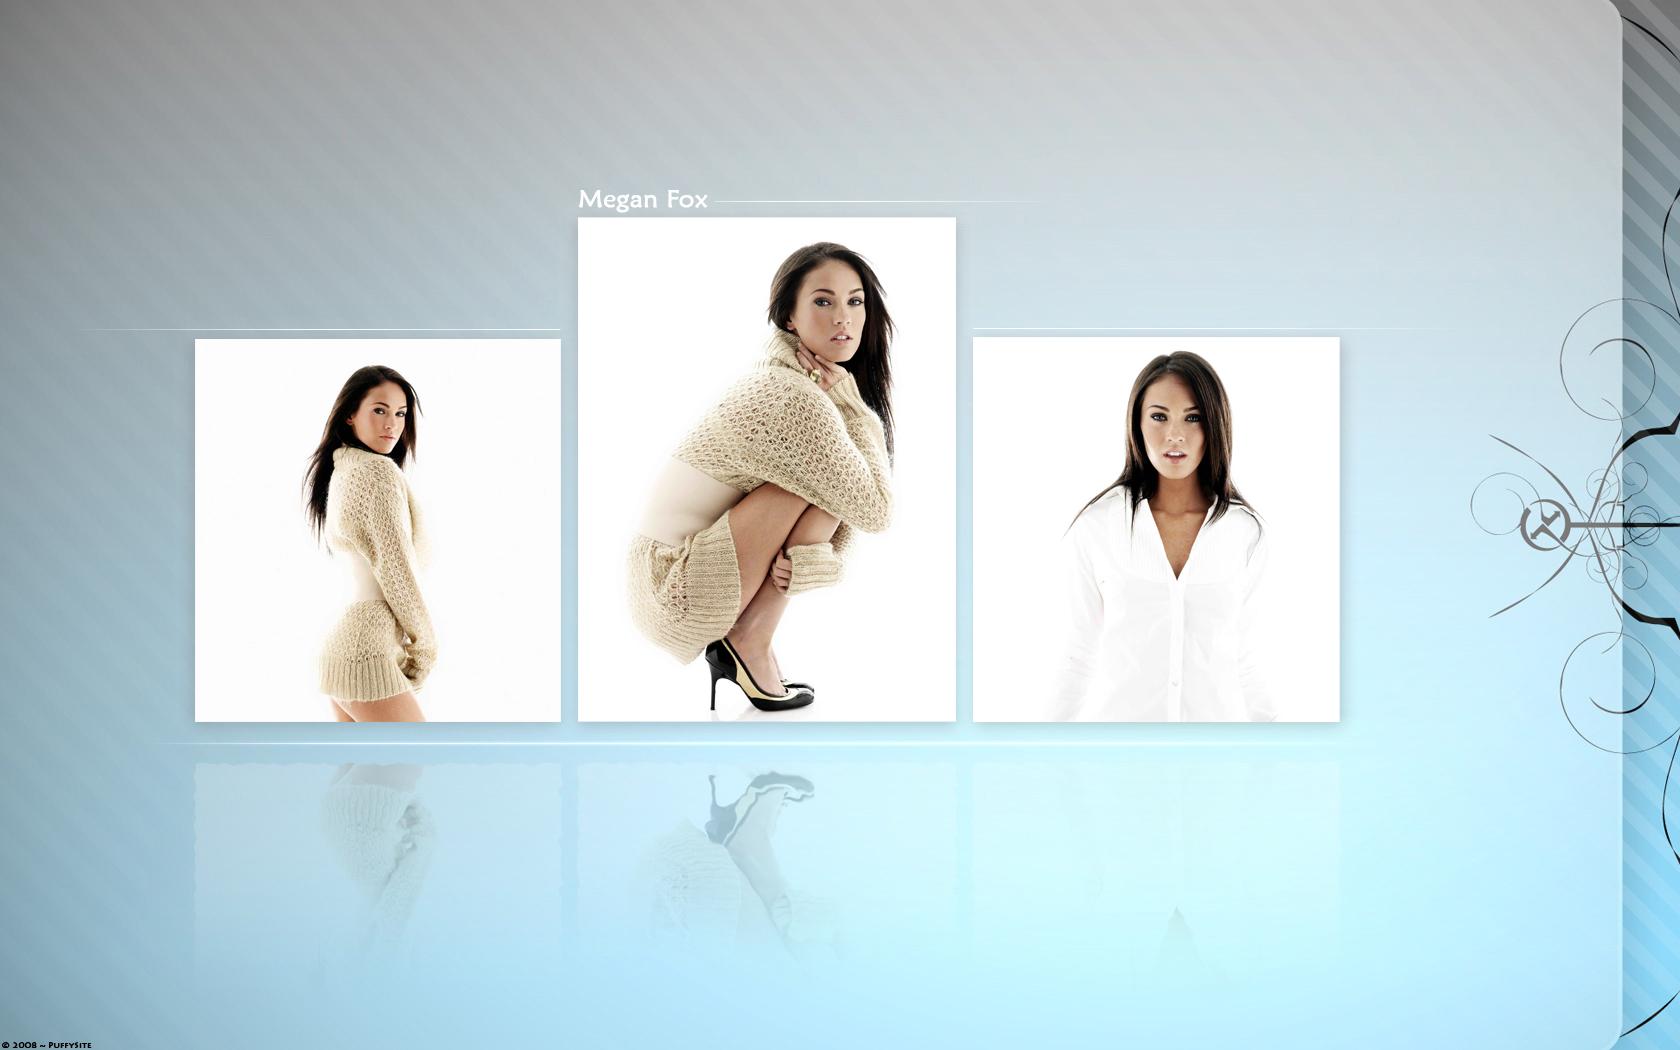 http://fc01.deviantart.net/fs26/f/2008/154/2/0/Megan_Fox_WSwp_by_puffysite.jpg